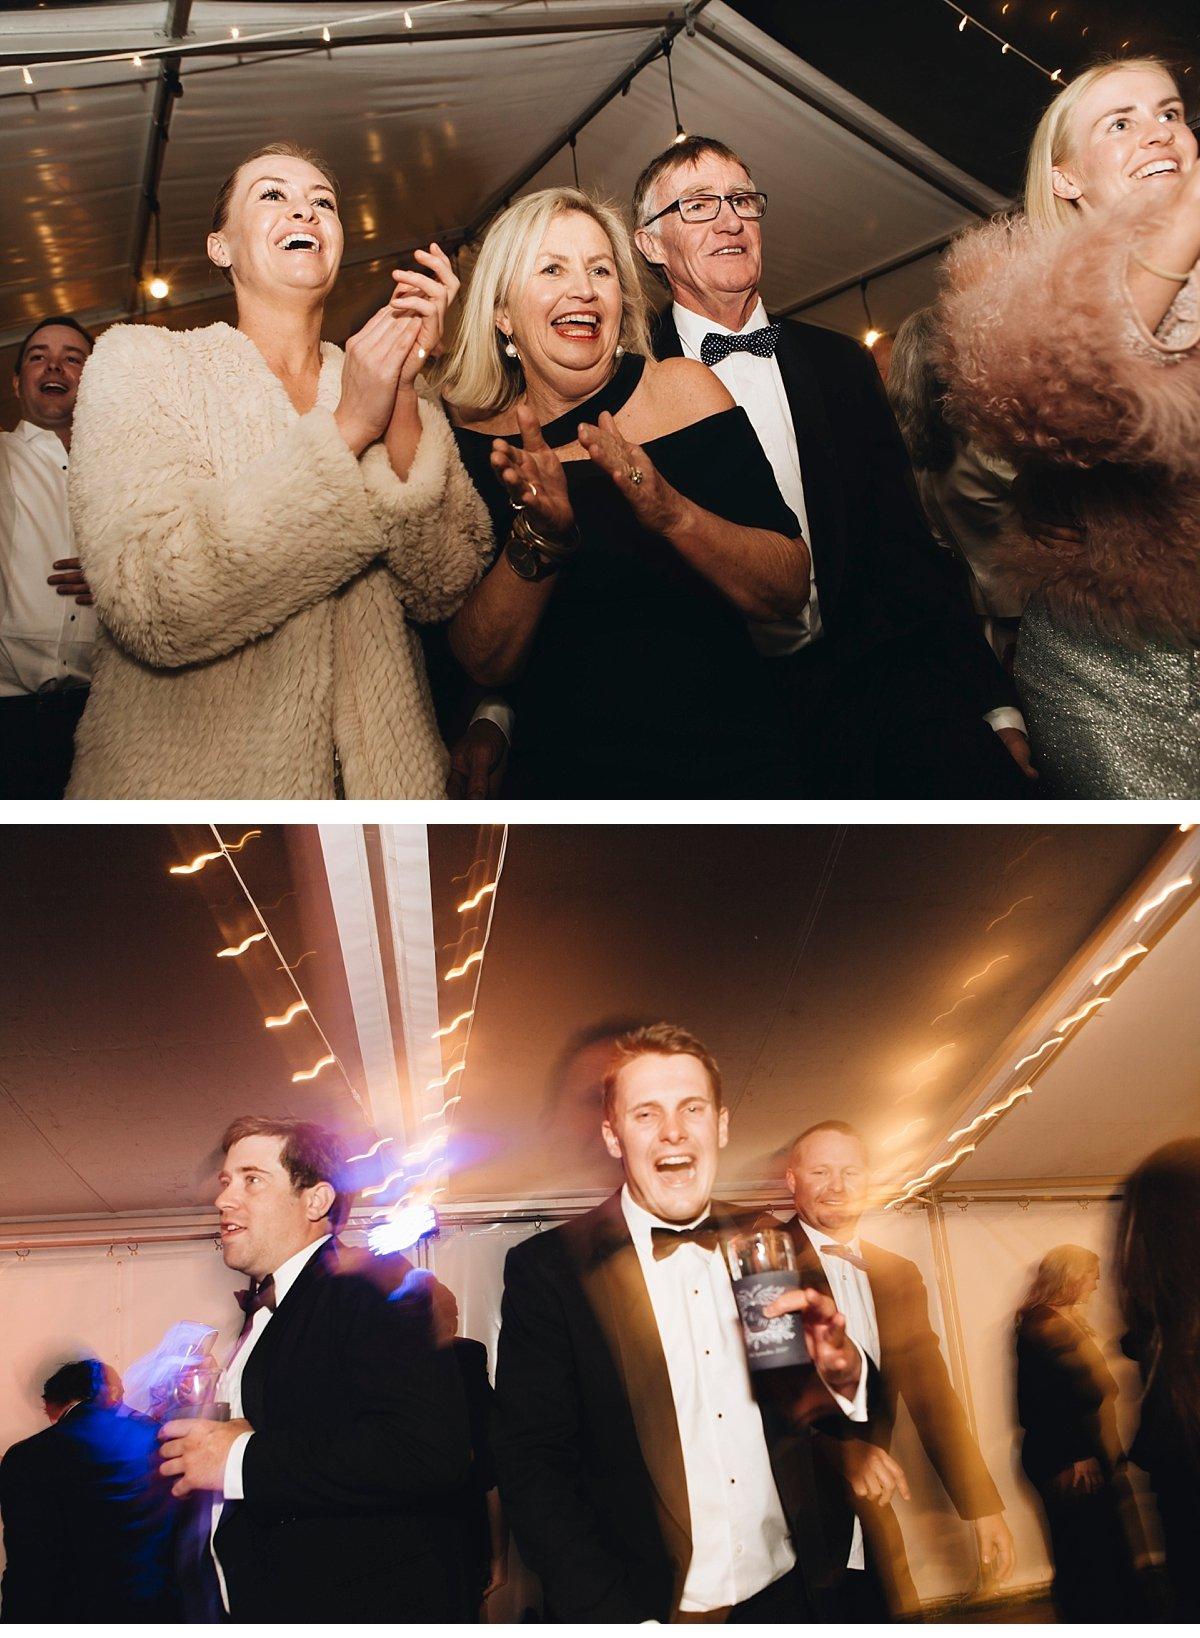 Gundagai Wedding Photographer NSW photographers Wagga Wagga Albury Rutherglen34